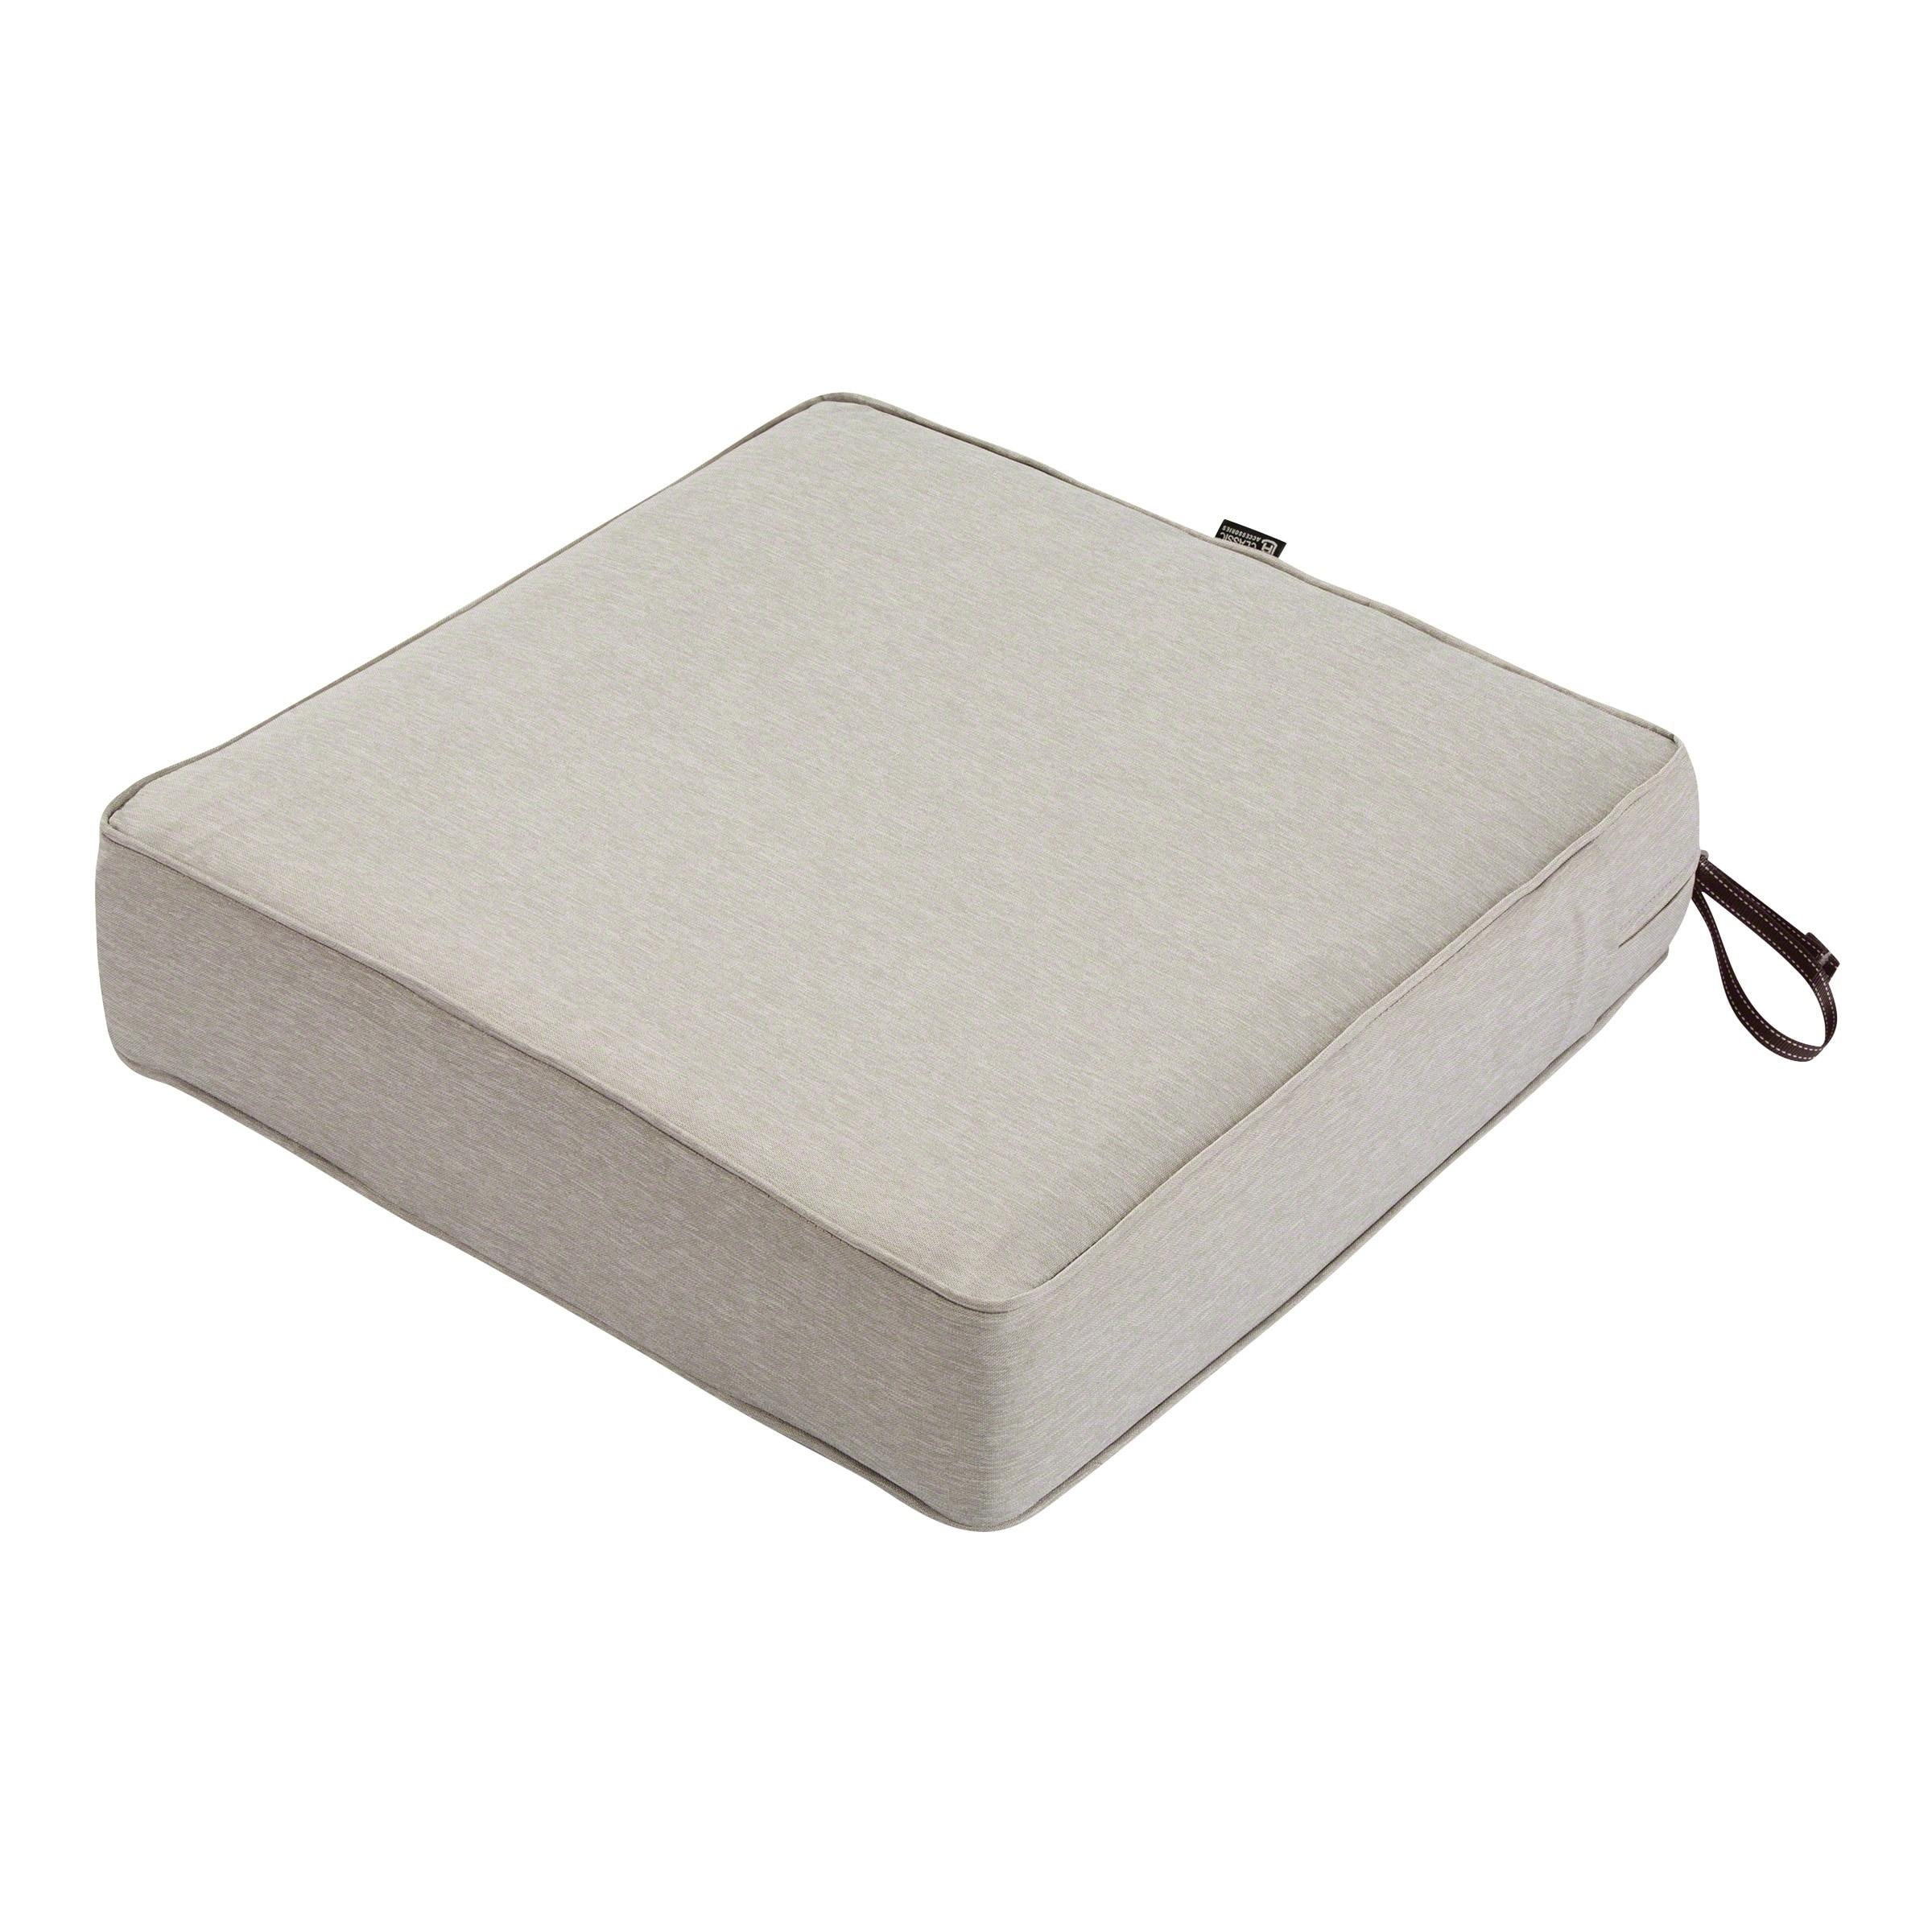 Montlake Fadesafe Squ Patio Lnge Seat Cushion 5 Thick 21 Wx21 Dx5 T